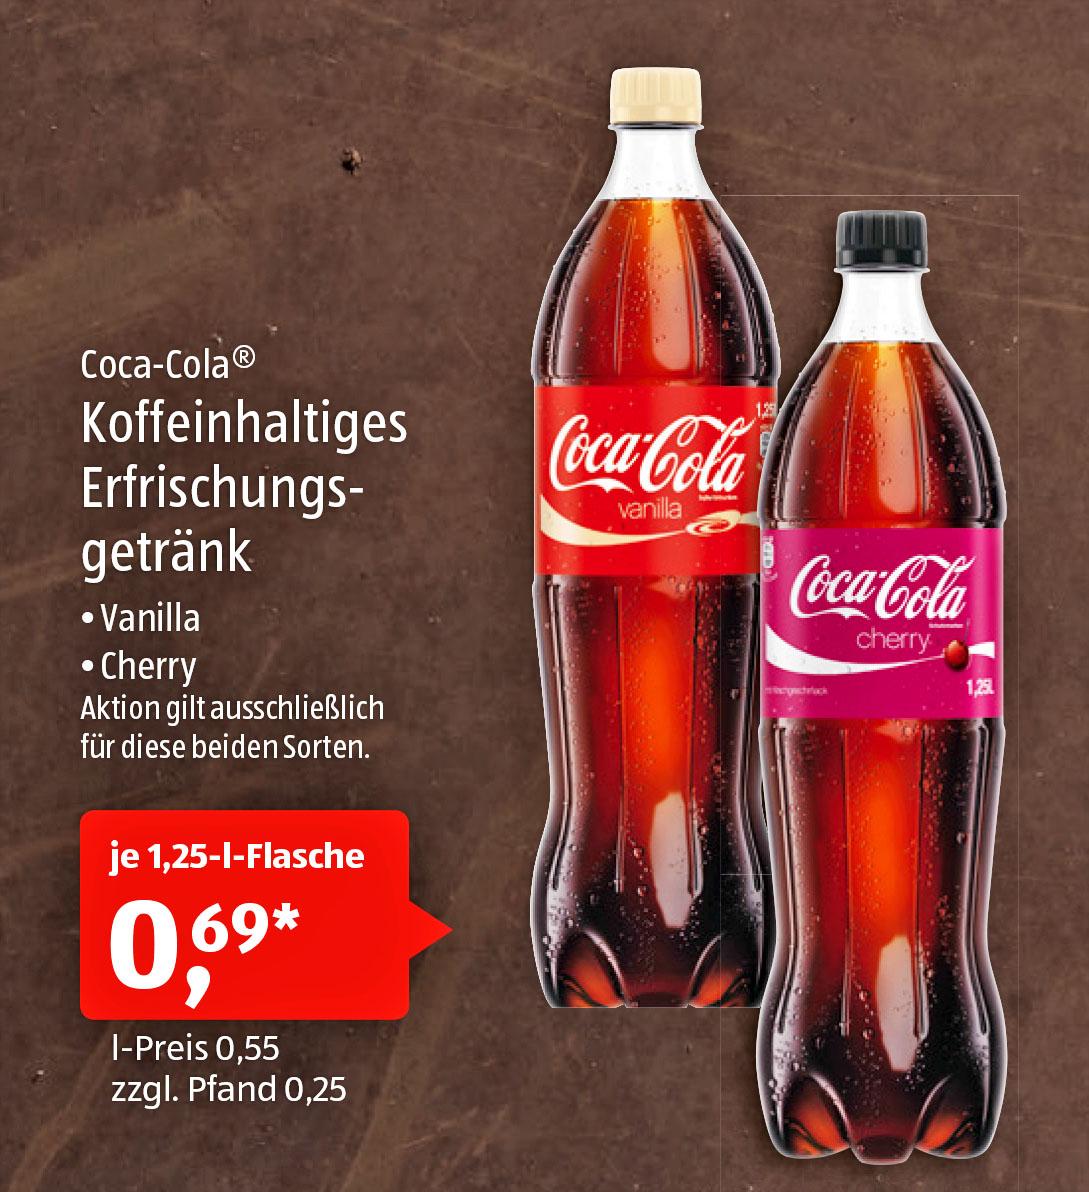 Vanilla Coke / Cherry Coke bei (Aldi Süd)